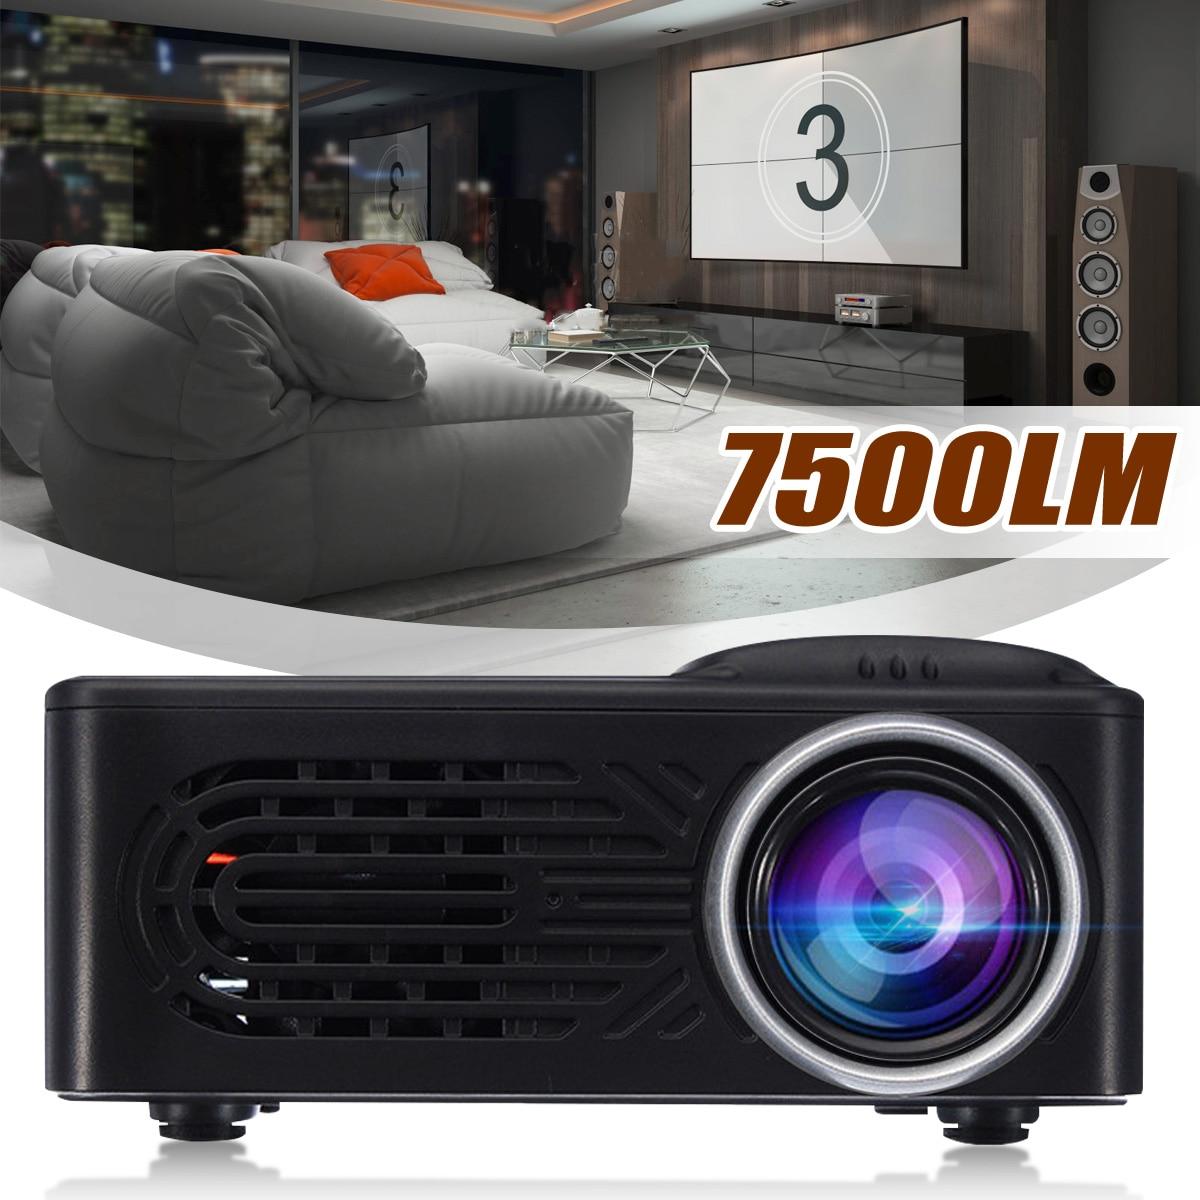 LEORY ใหม่ล่าสุด 7500 Lumens 1080P HD LED โปรเจคเตอร์พกพา 320x240 ความละเอียดมัลติมีเดียโฮมเธียเตอร์ภาพยนตร์ Beamer โร...